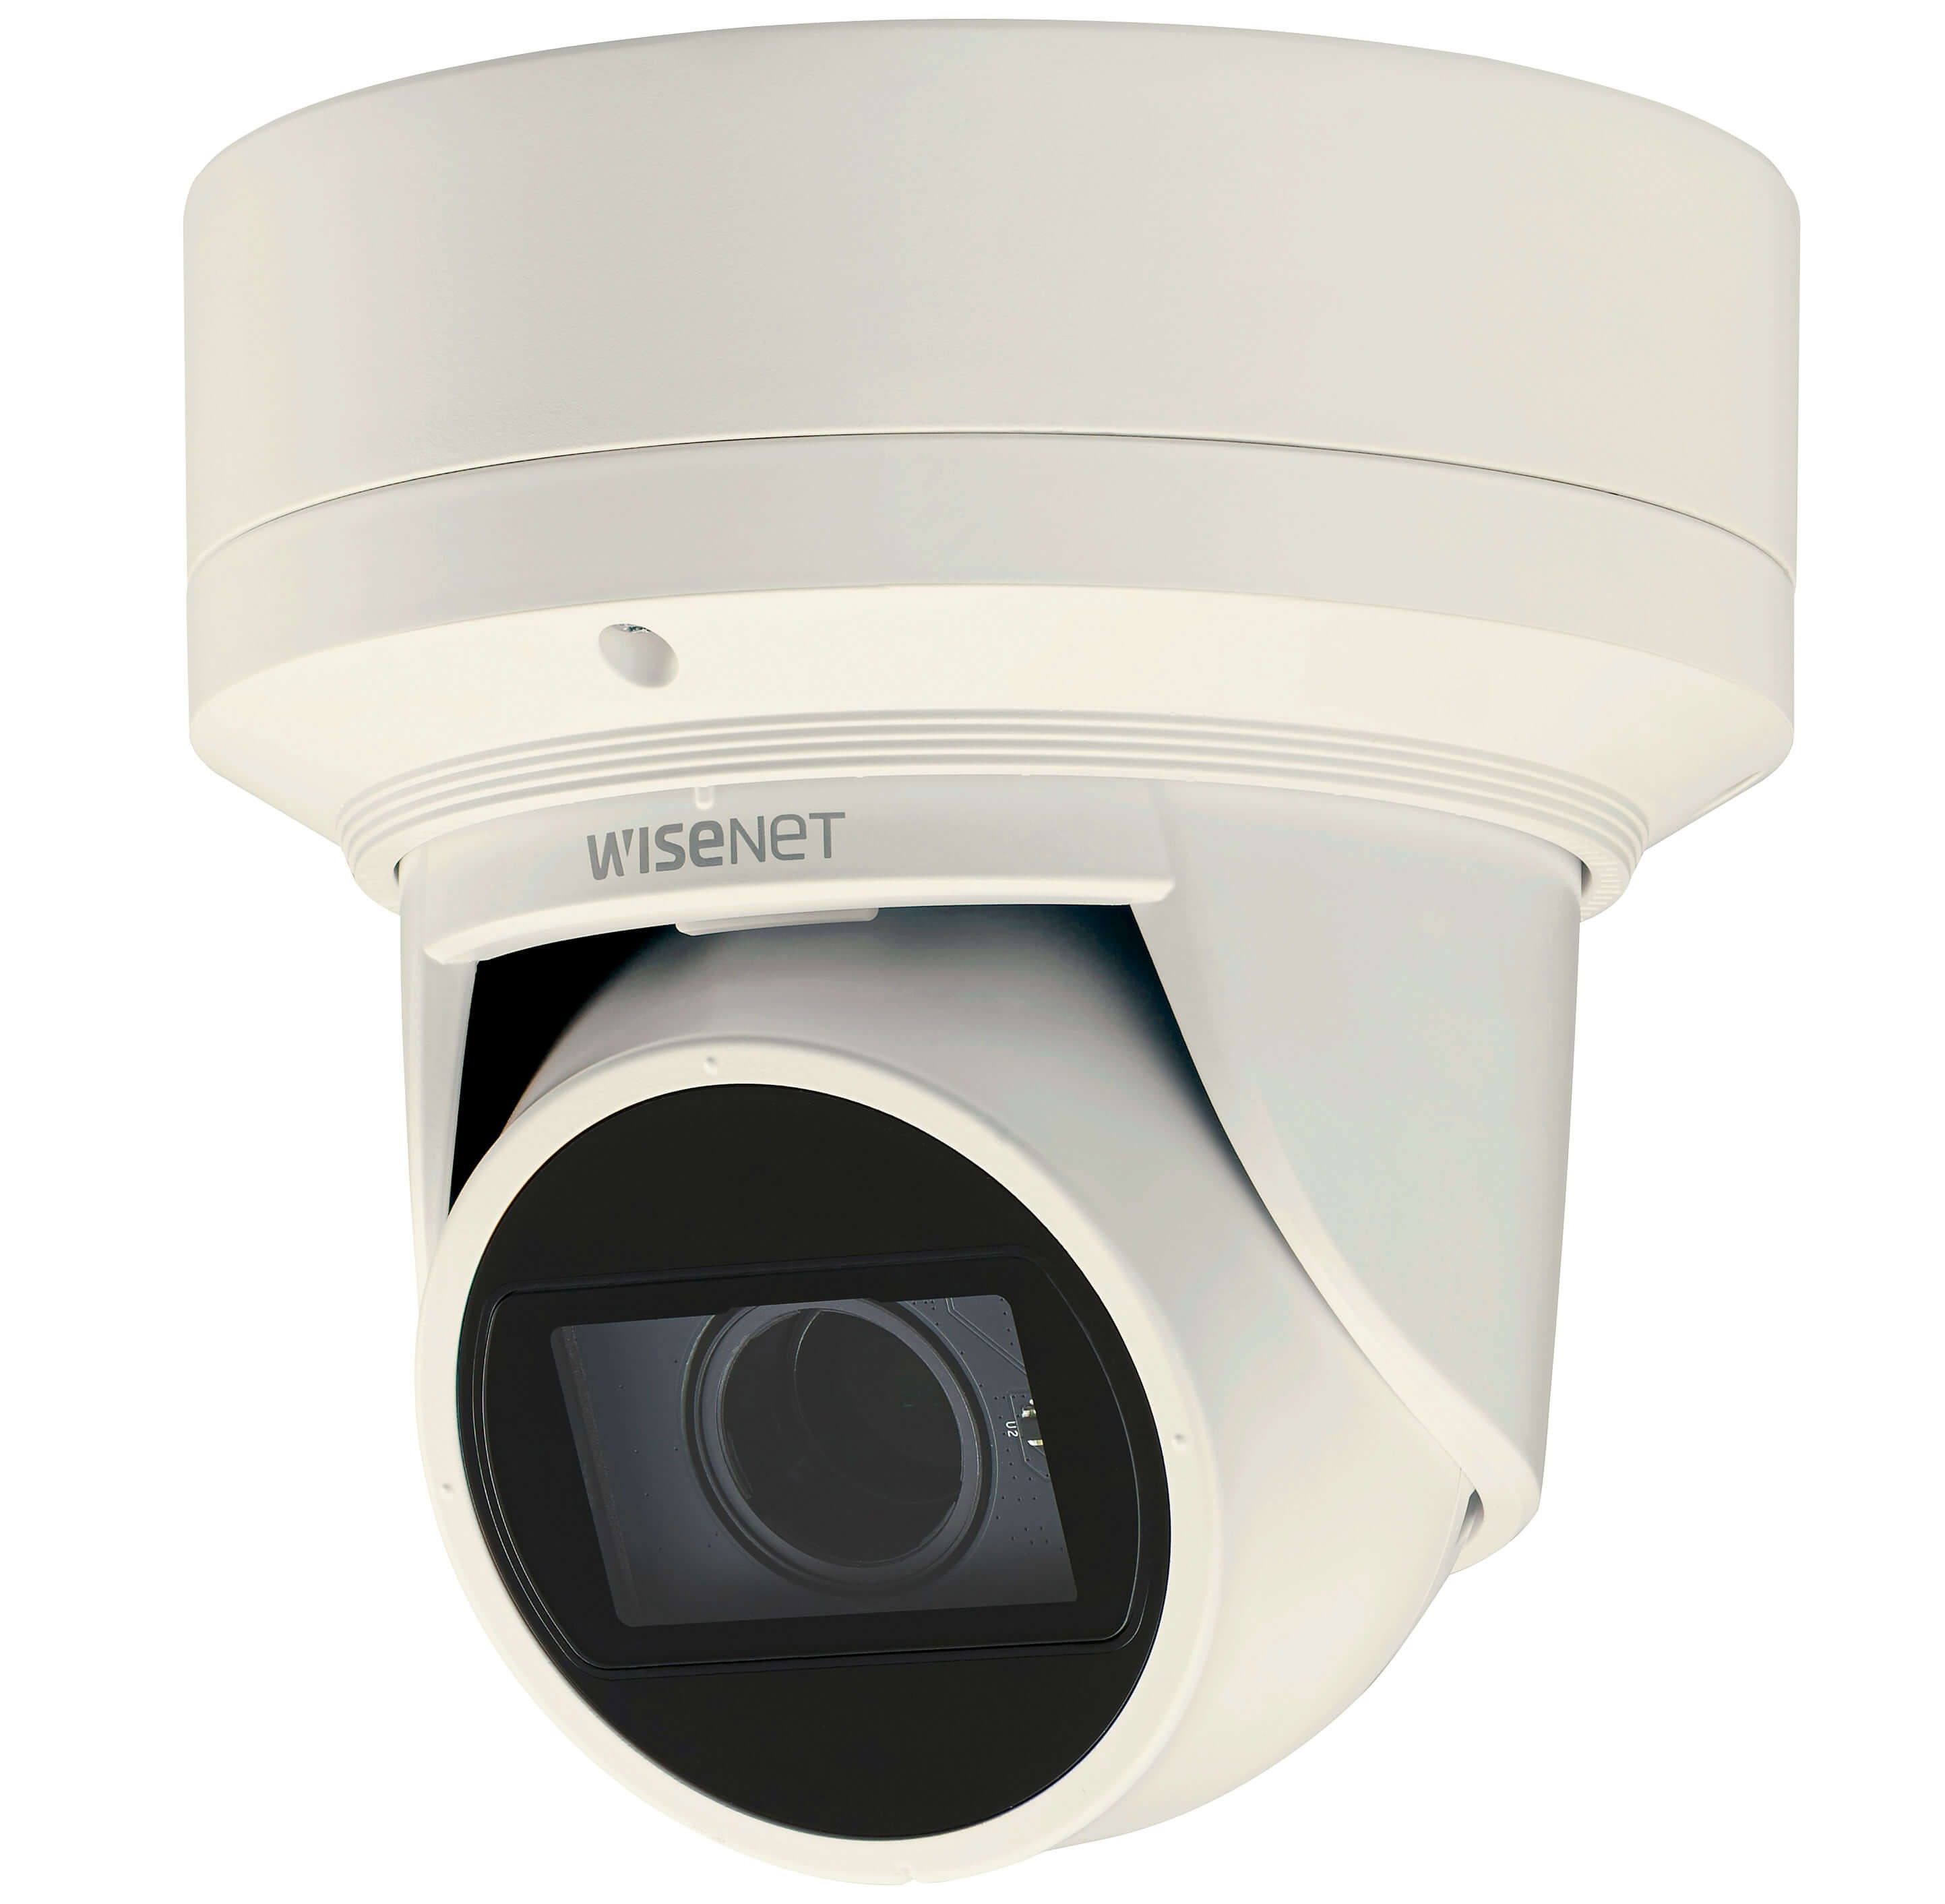 Samsung / Hanwha QNE7080RV 4 Megapixel H.265 Network IR Flateye Camera